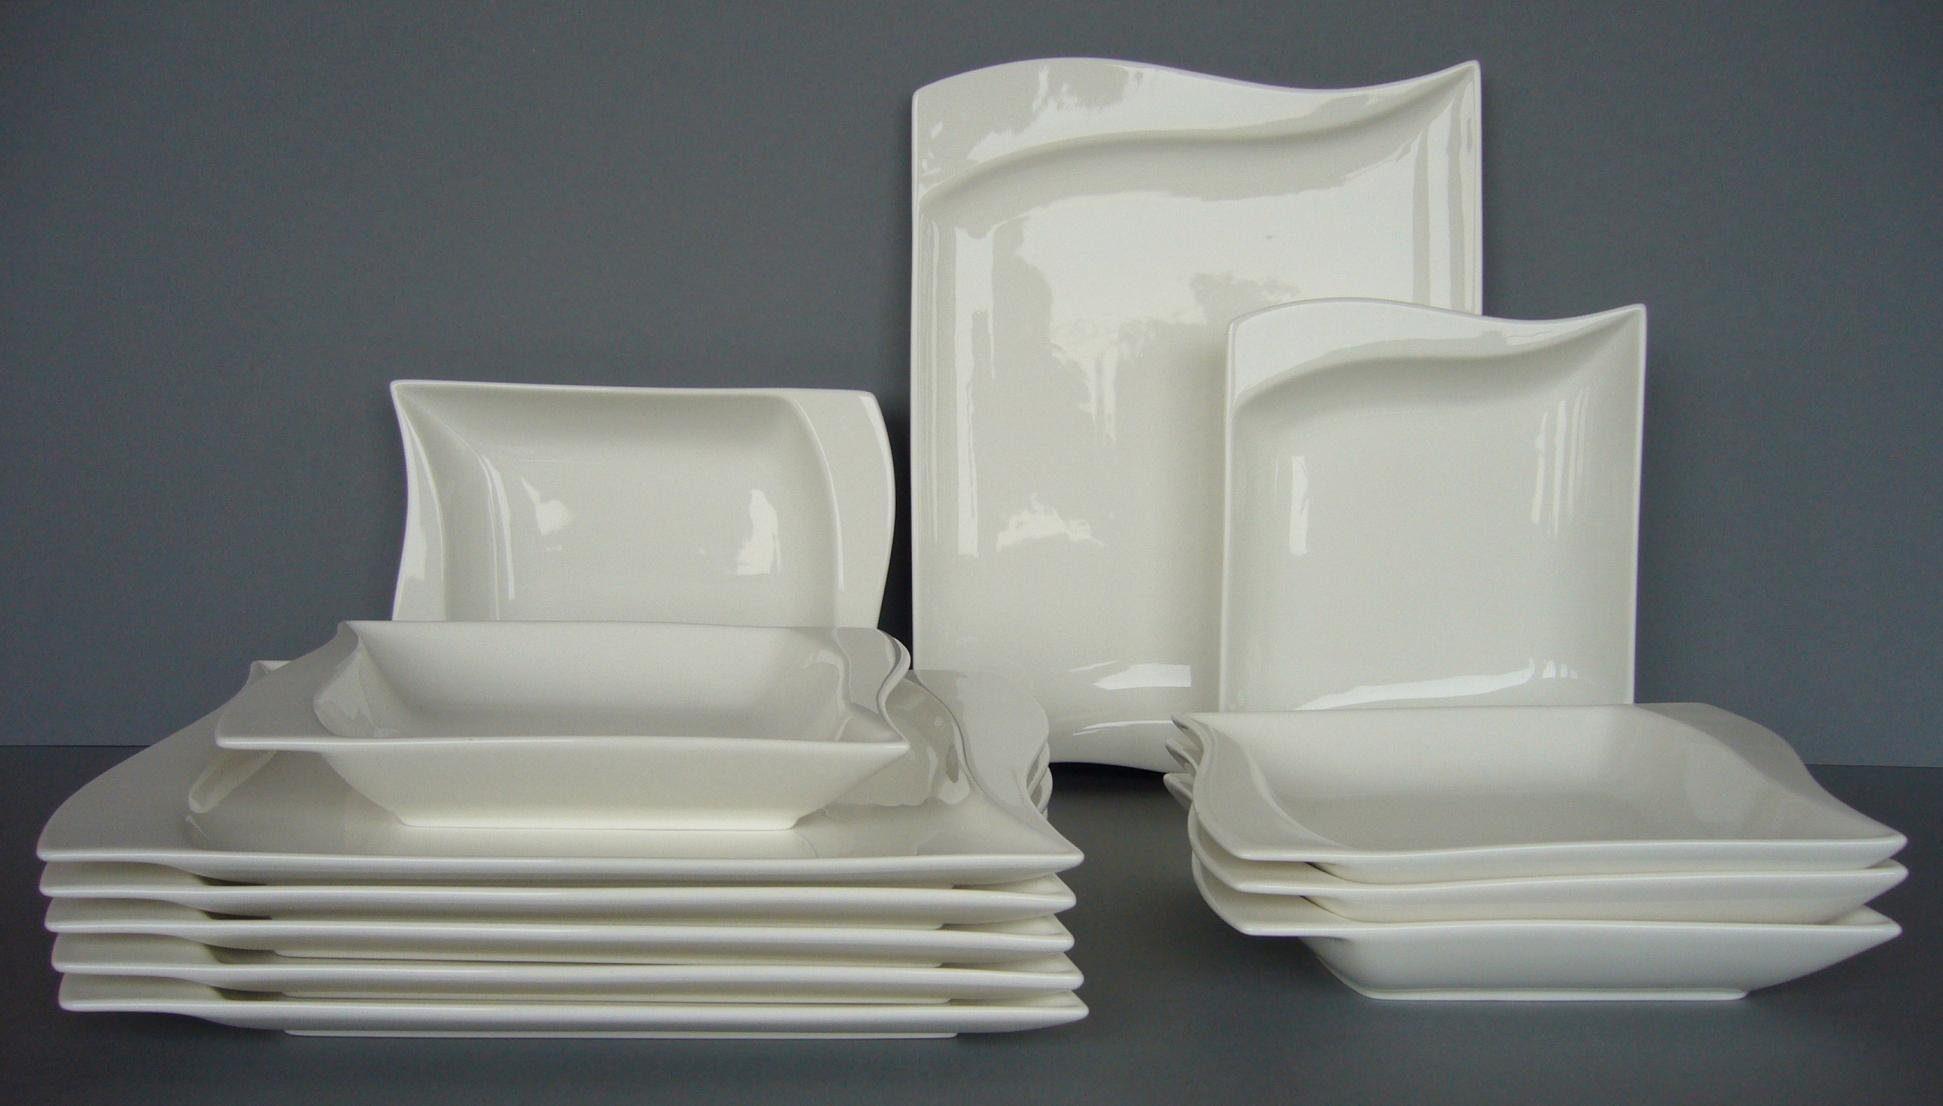 Van Well Tafelservice, Porzellan, 12 Teile, für 6 Personen, »Harmony«